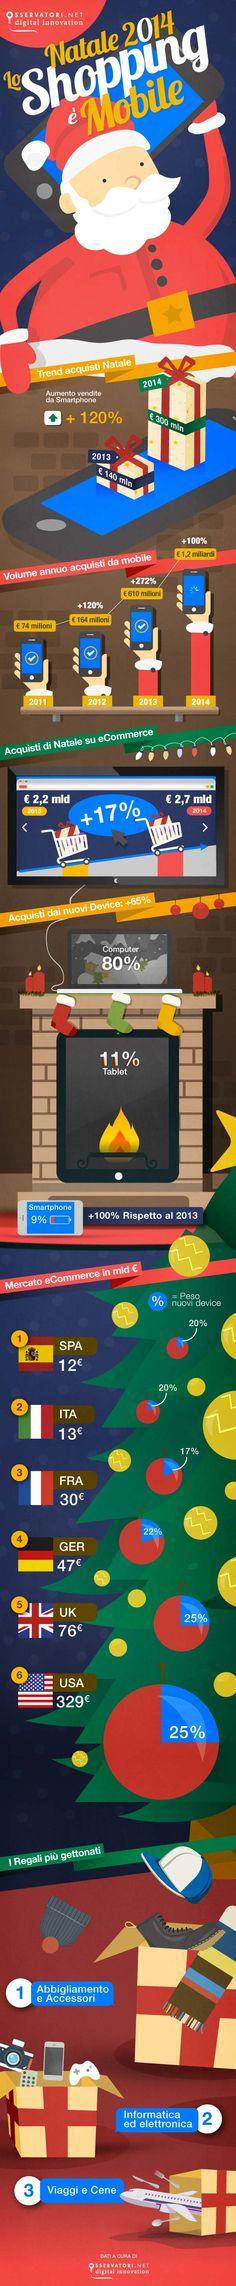 Natale 2014, i regali si acquistano via #Mobile [Infografica] via @franzrusso  #ecommerce #mobilecommerce